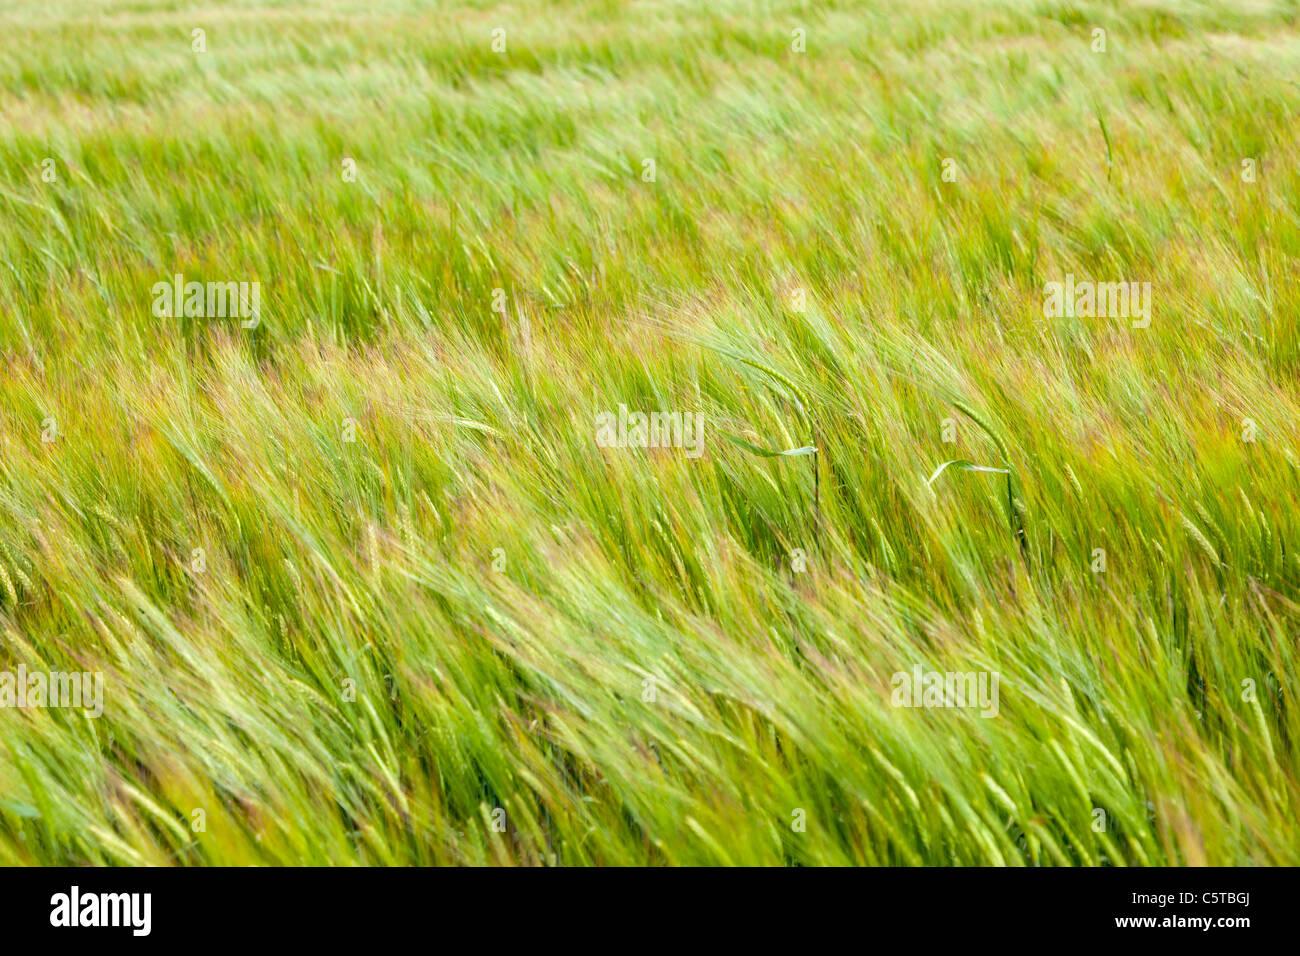 Wheat ripening the the field Cornwall UK - Stock Image